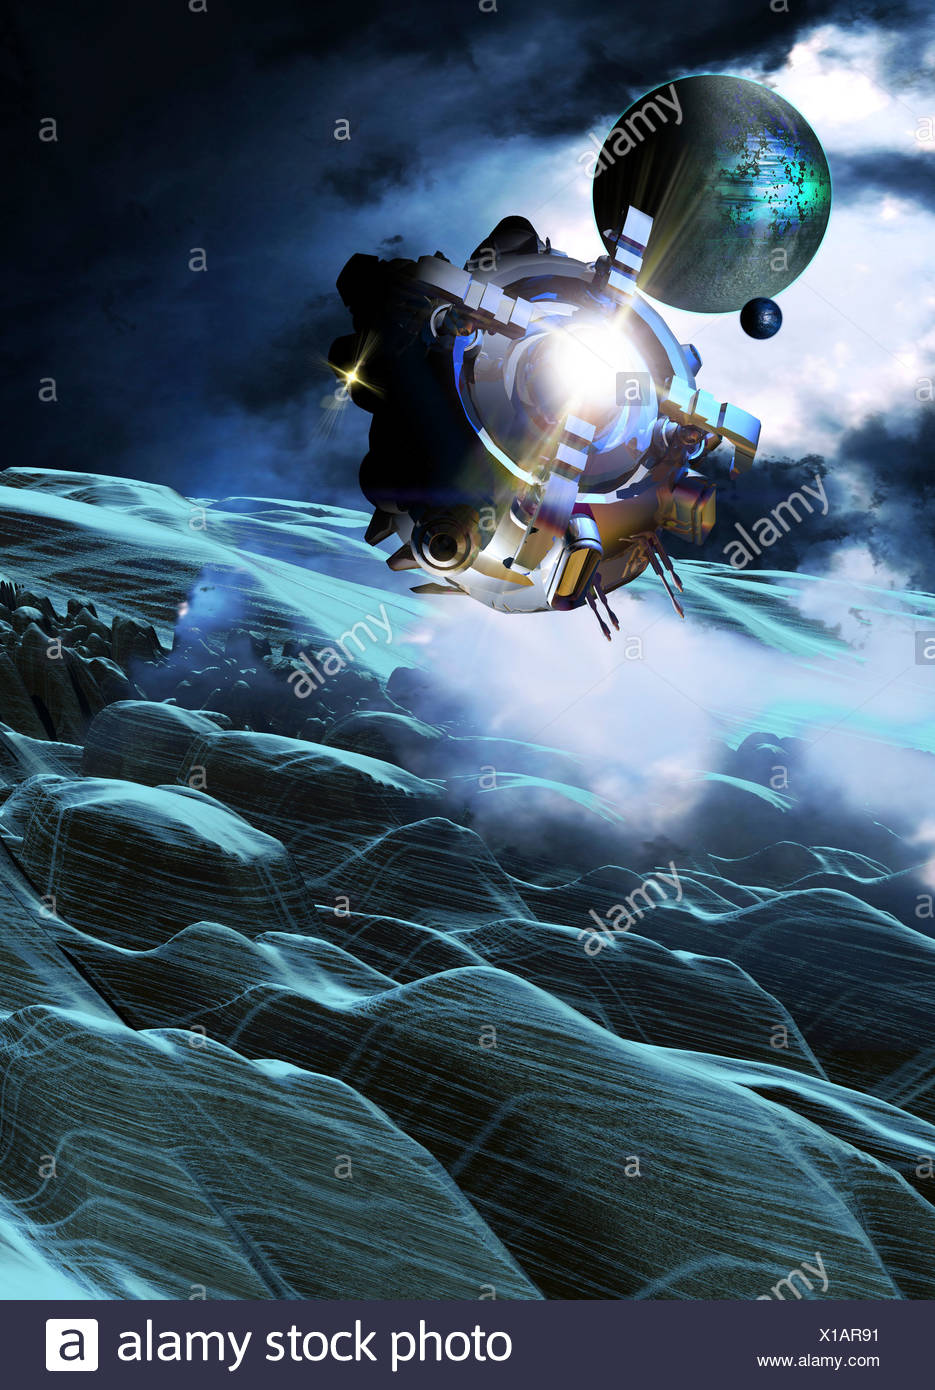 Space exploration, artwork - Stock Image